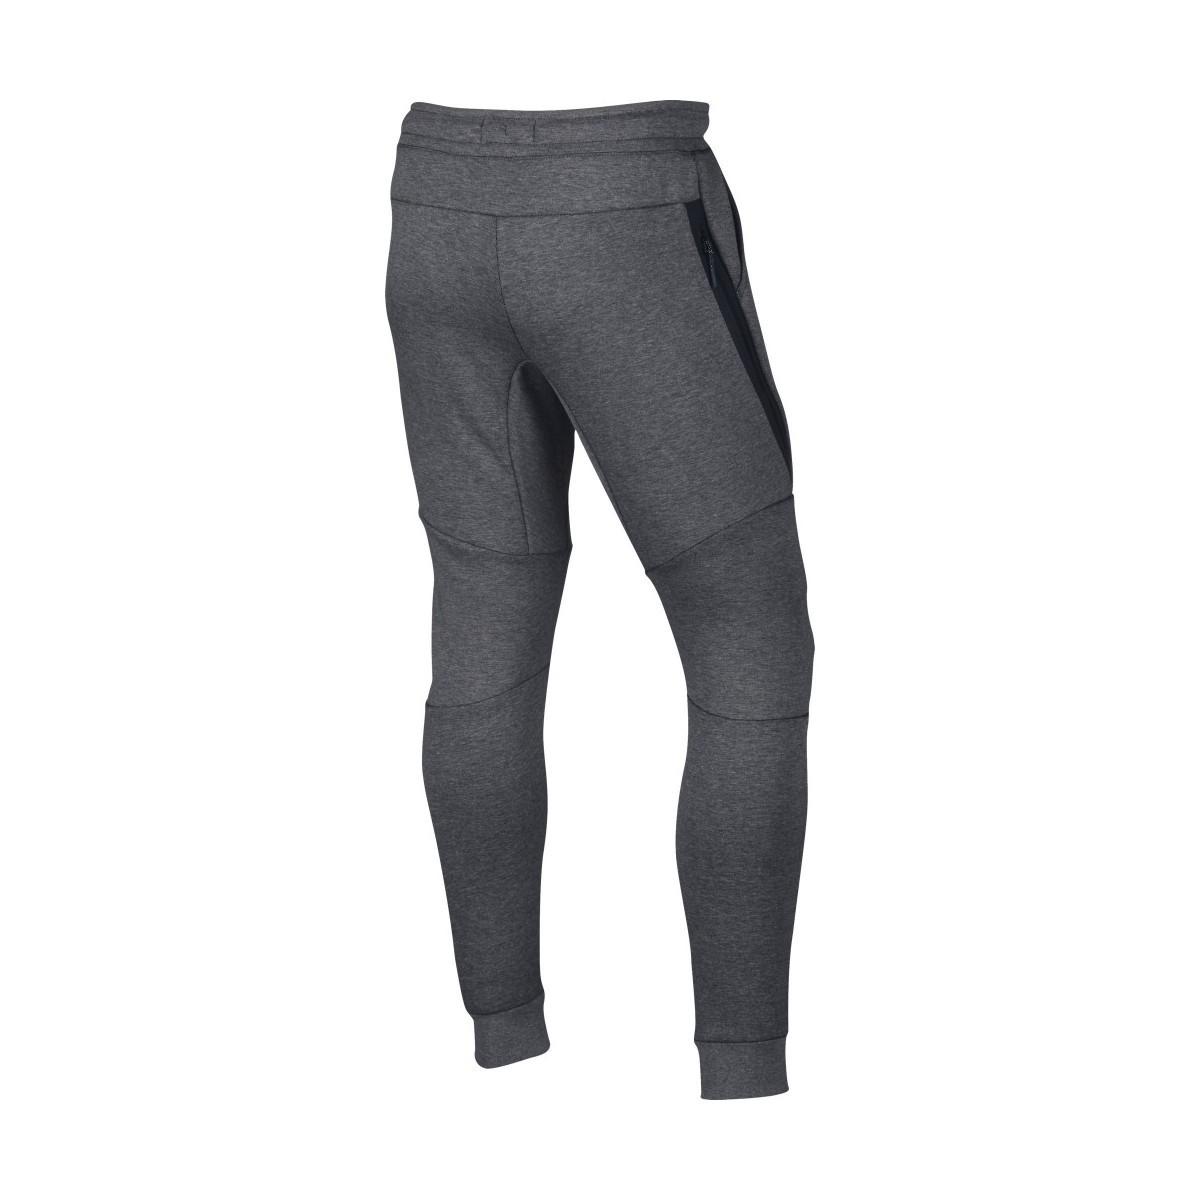 Pantalon de survêtement Sportswear Tech Fleece - 805162-091